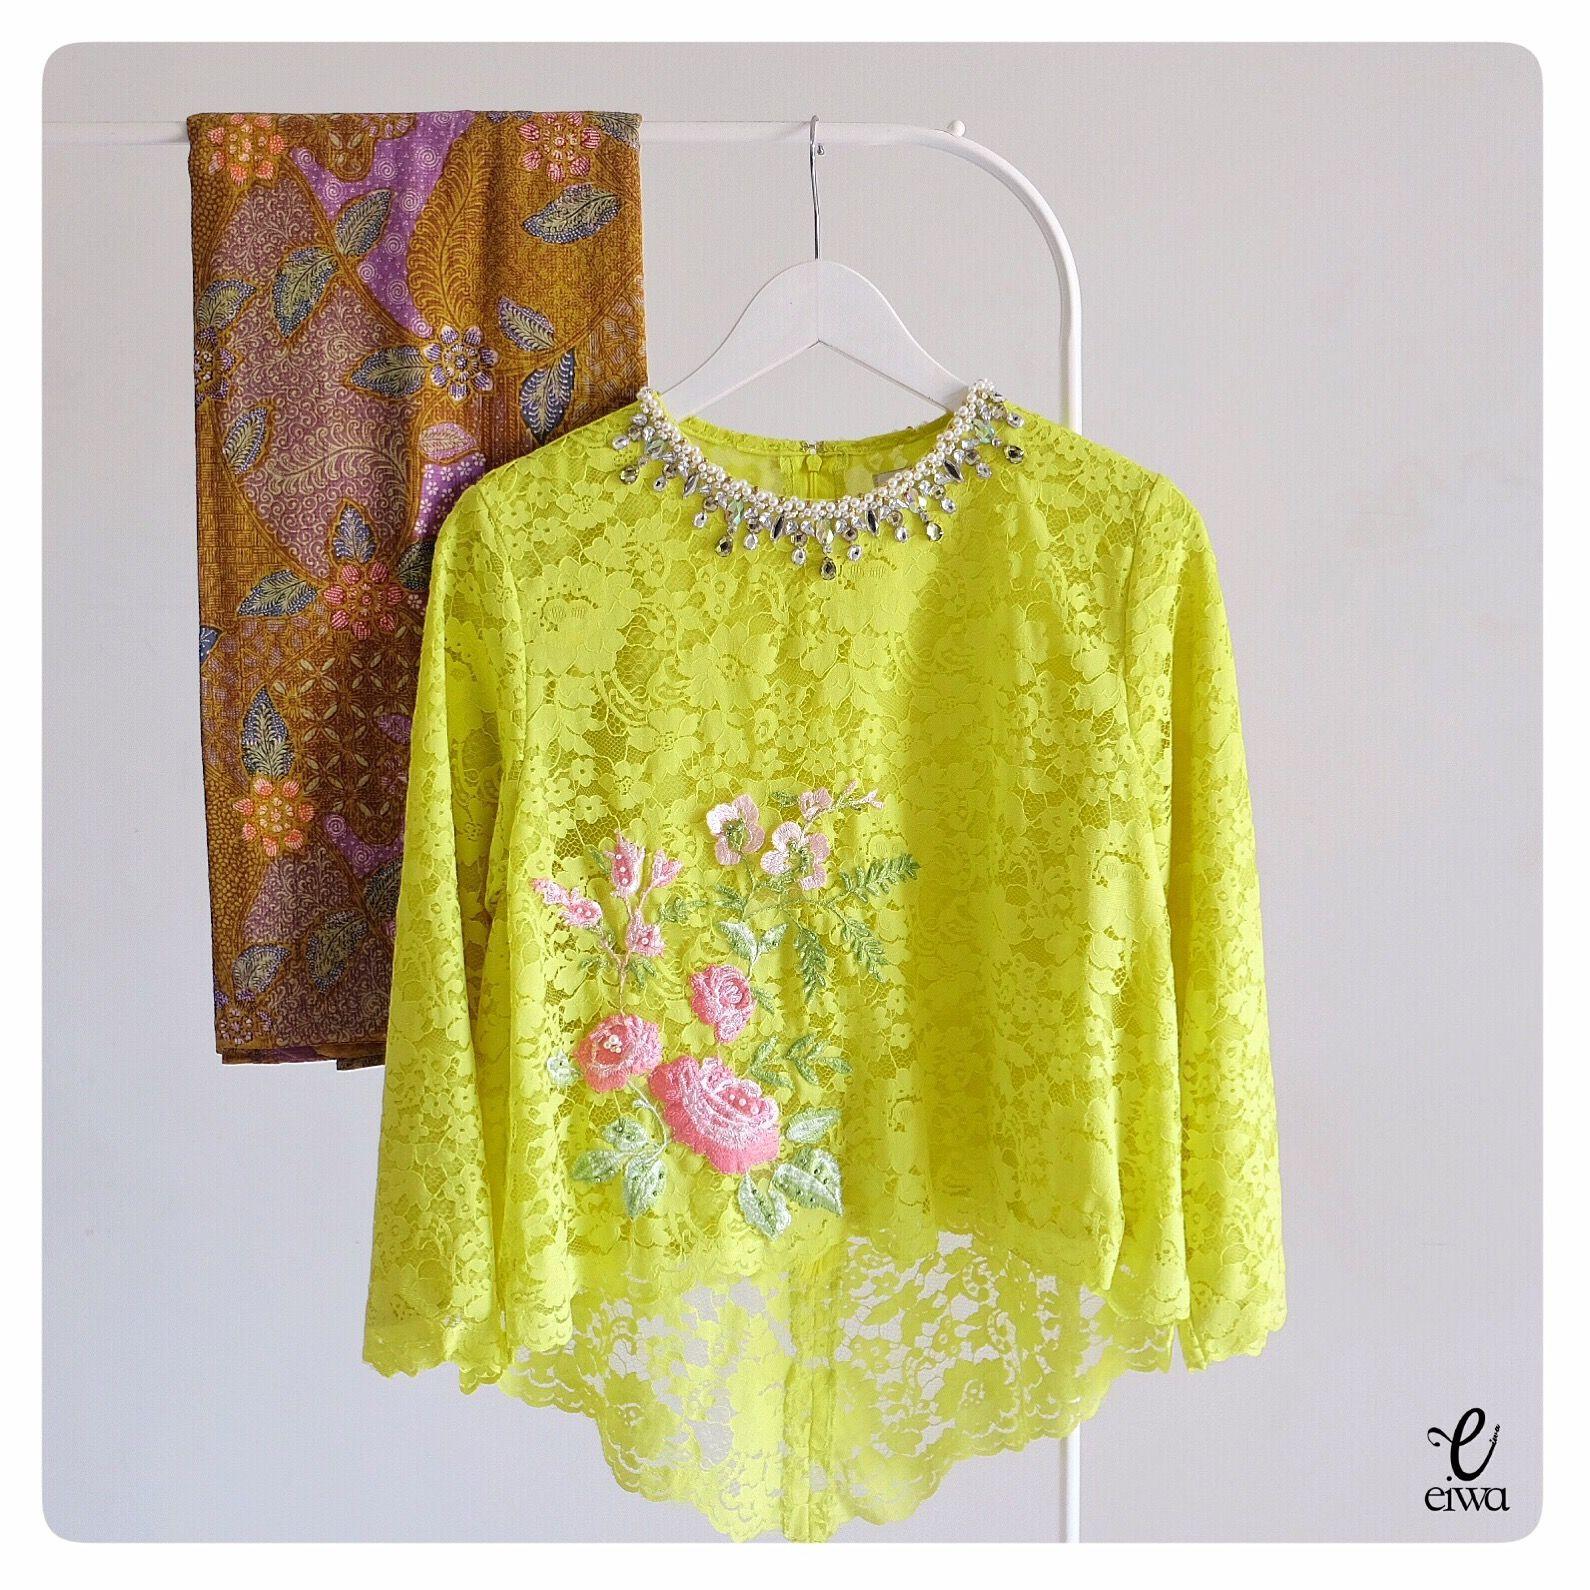 Kebaya Indonesia modern high low - hi low lace brokat organdi organdy  organza embellished embroidery long sleeve hijab muslim baju bodo IG     eiwaonline 9a31dfeb0e